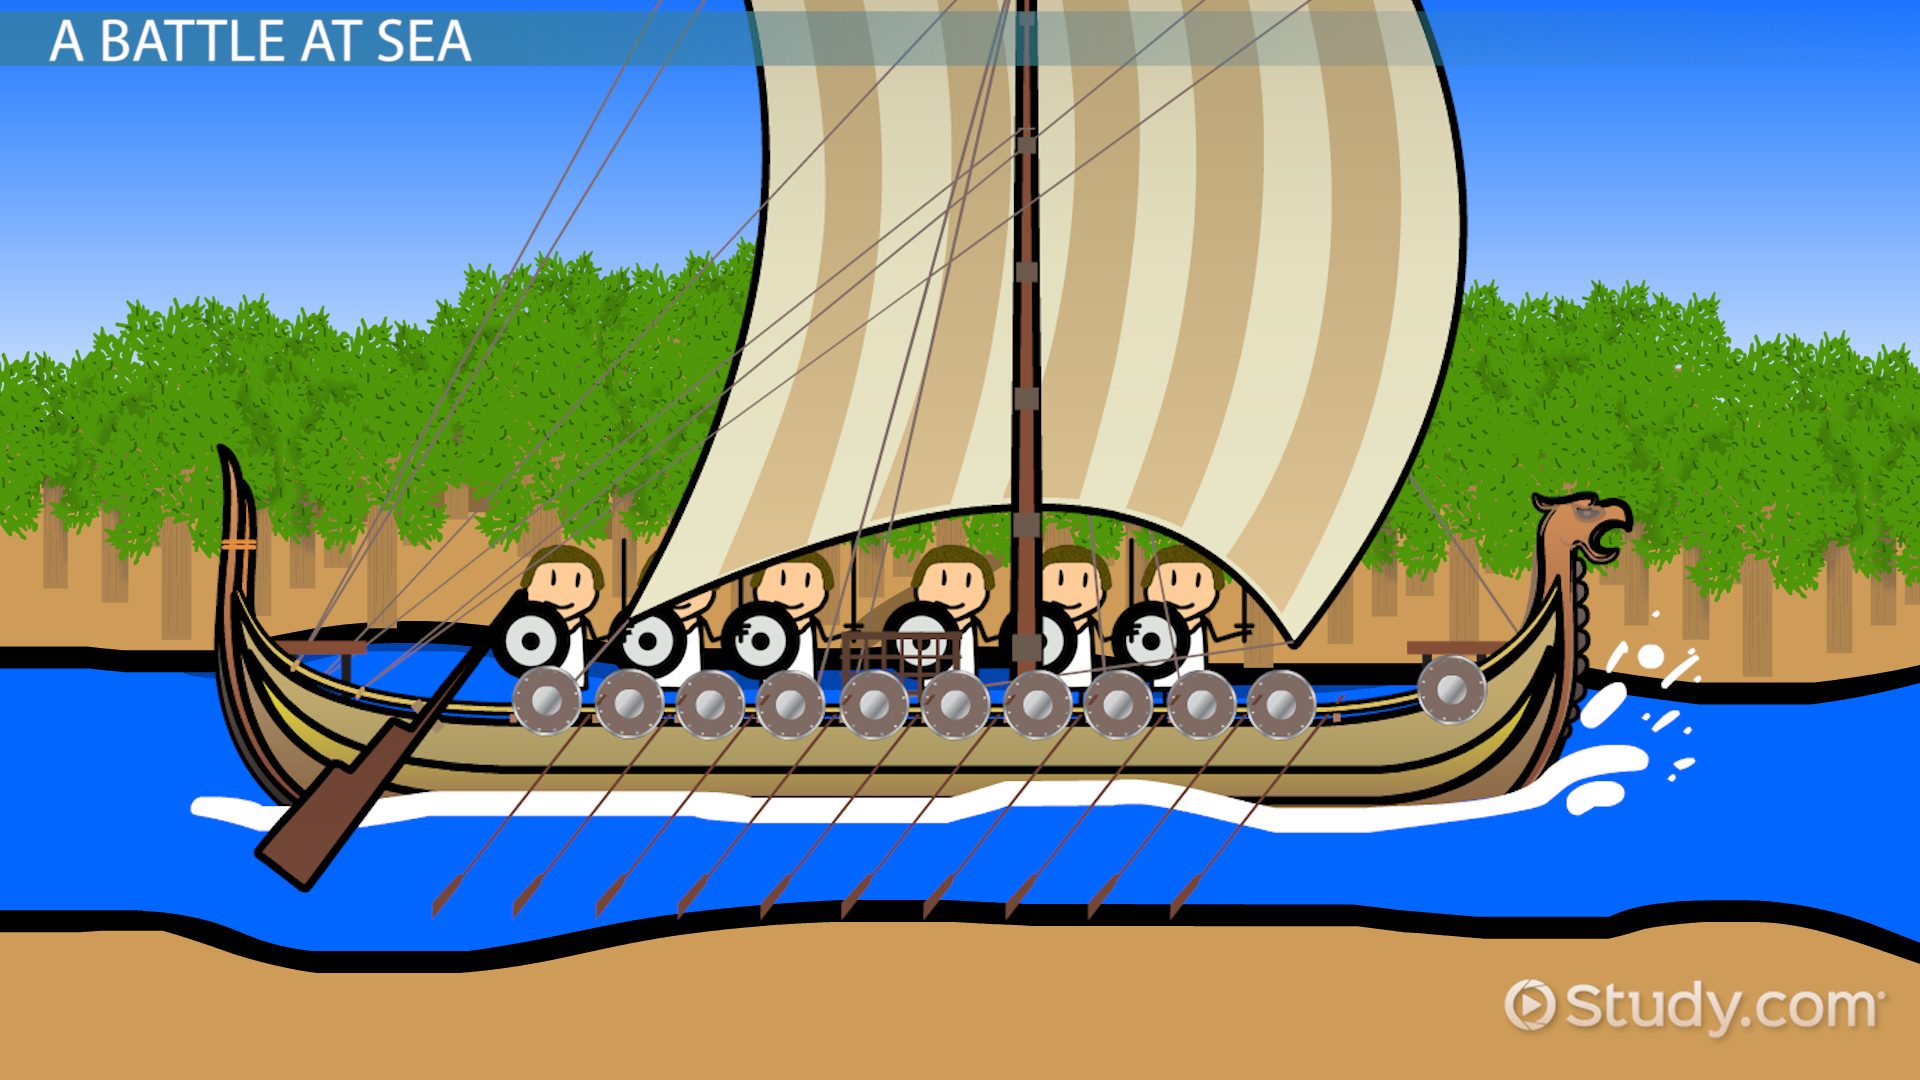 Battle of Salamis: description, history, participants and results 54